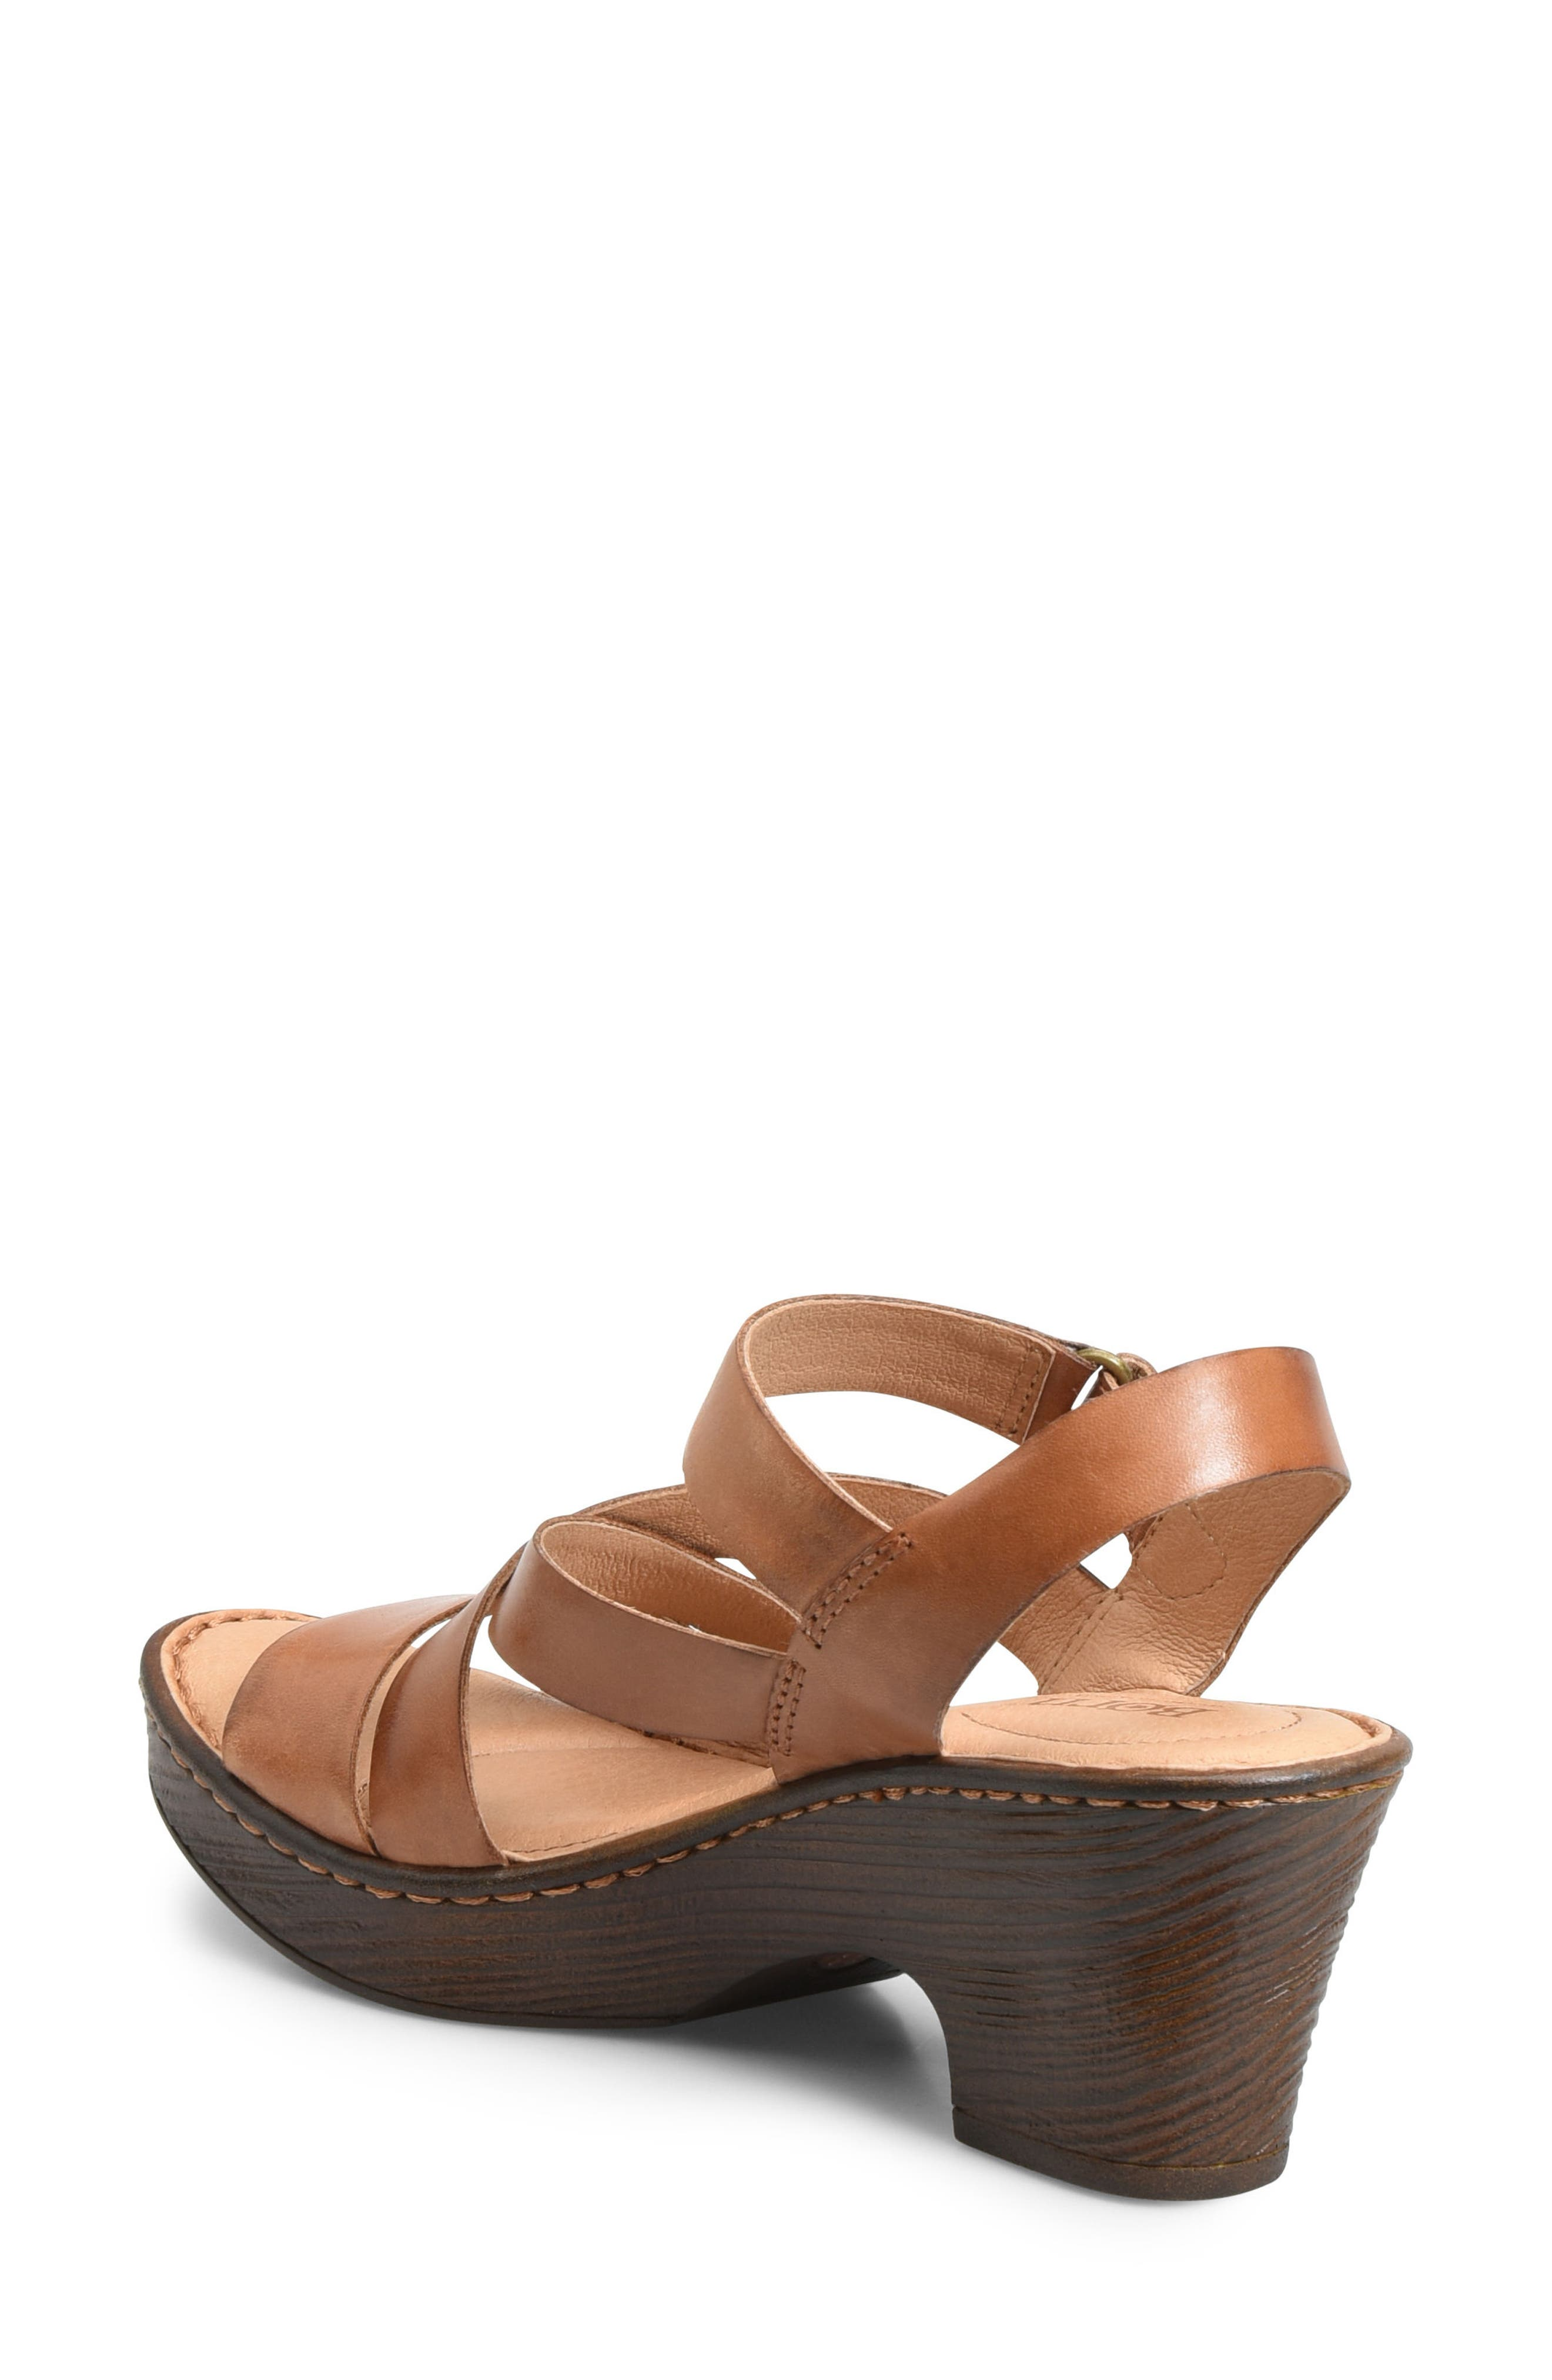 Cubera Platform Sandal,                             Alternate thumbnail 2, color,                             Brown Leather